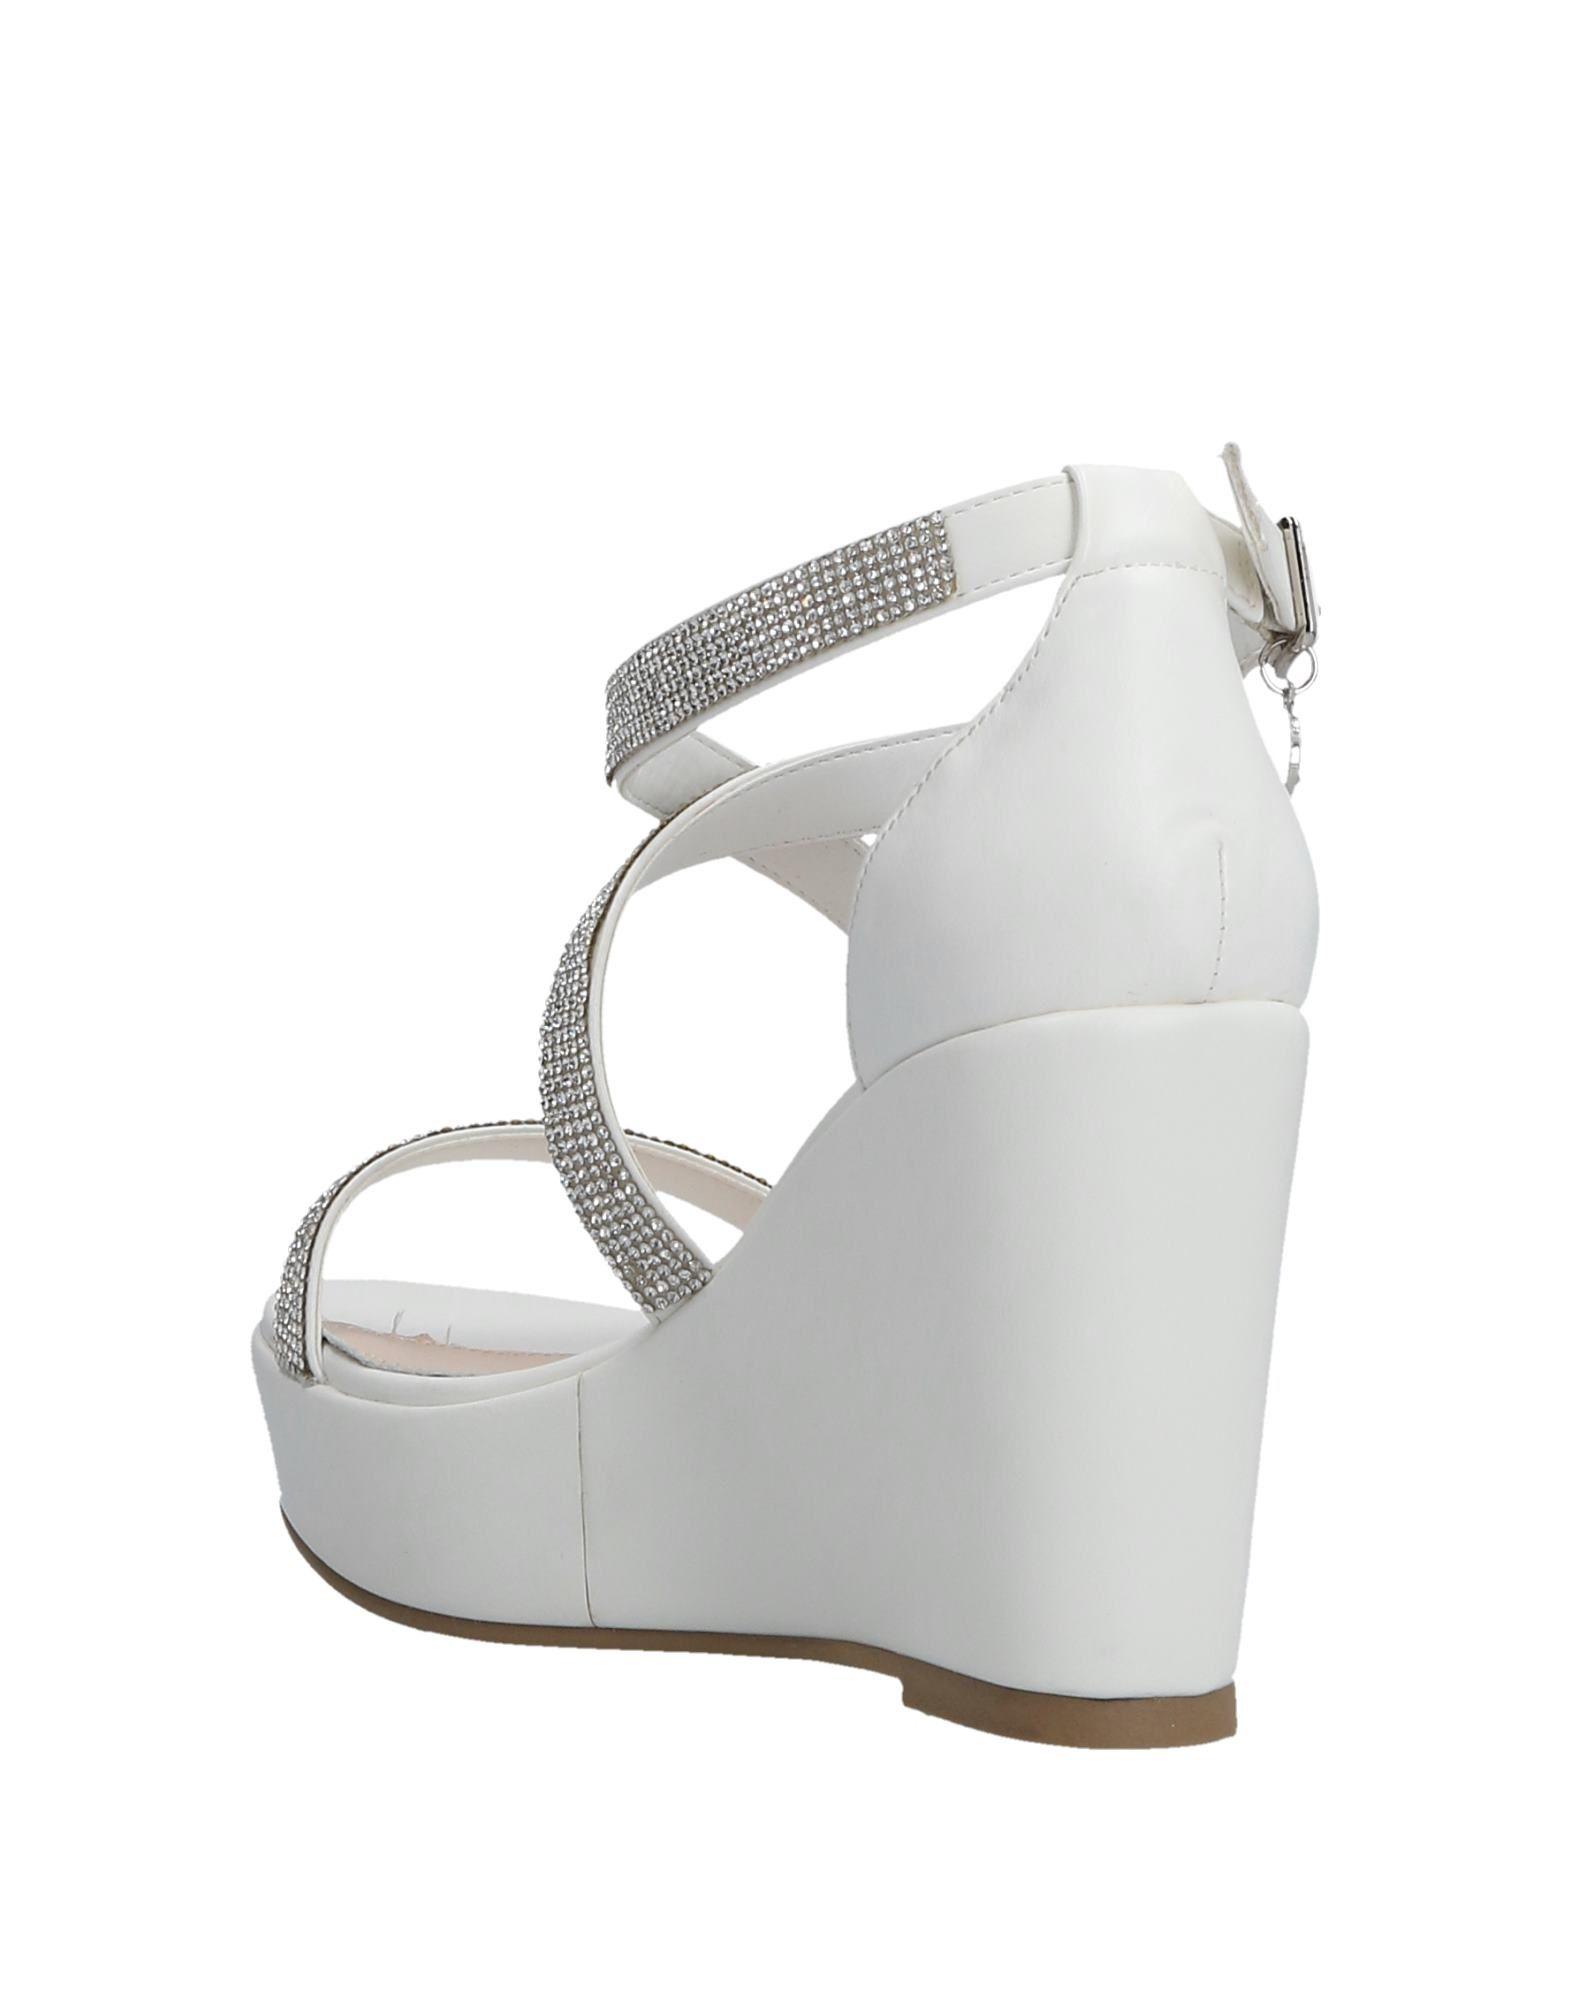 Ikaros Gute Sandalen Damen  11532743BV Gute Ikaros Qualität beliebte Schuhe 84ff2d